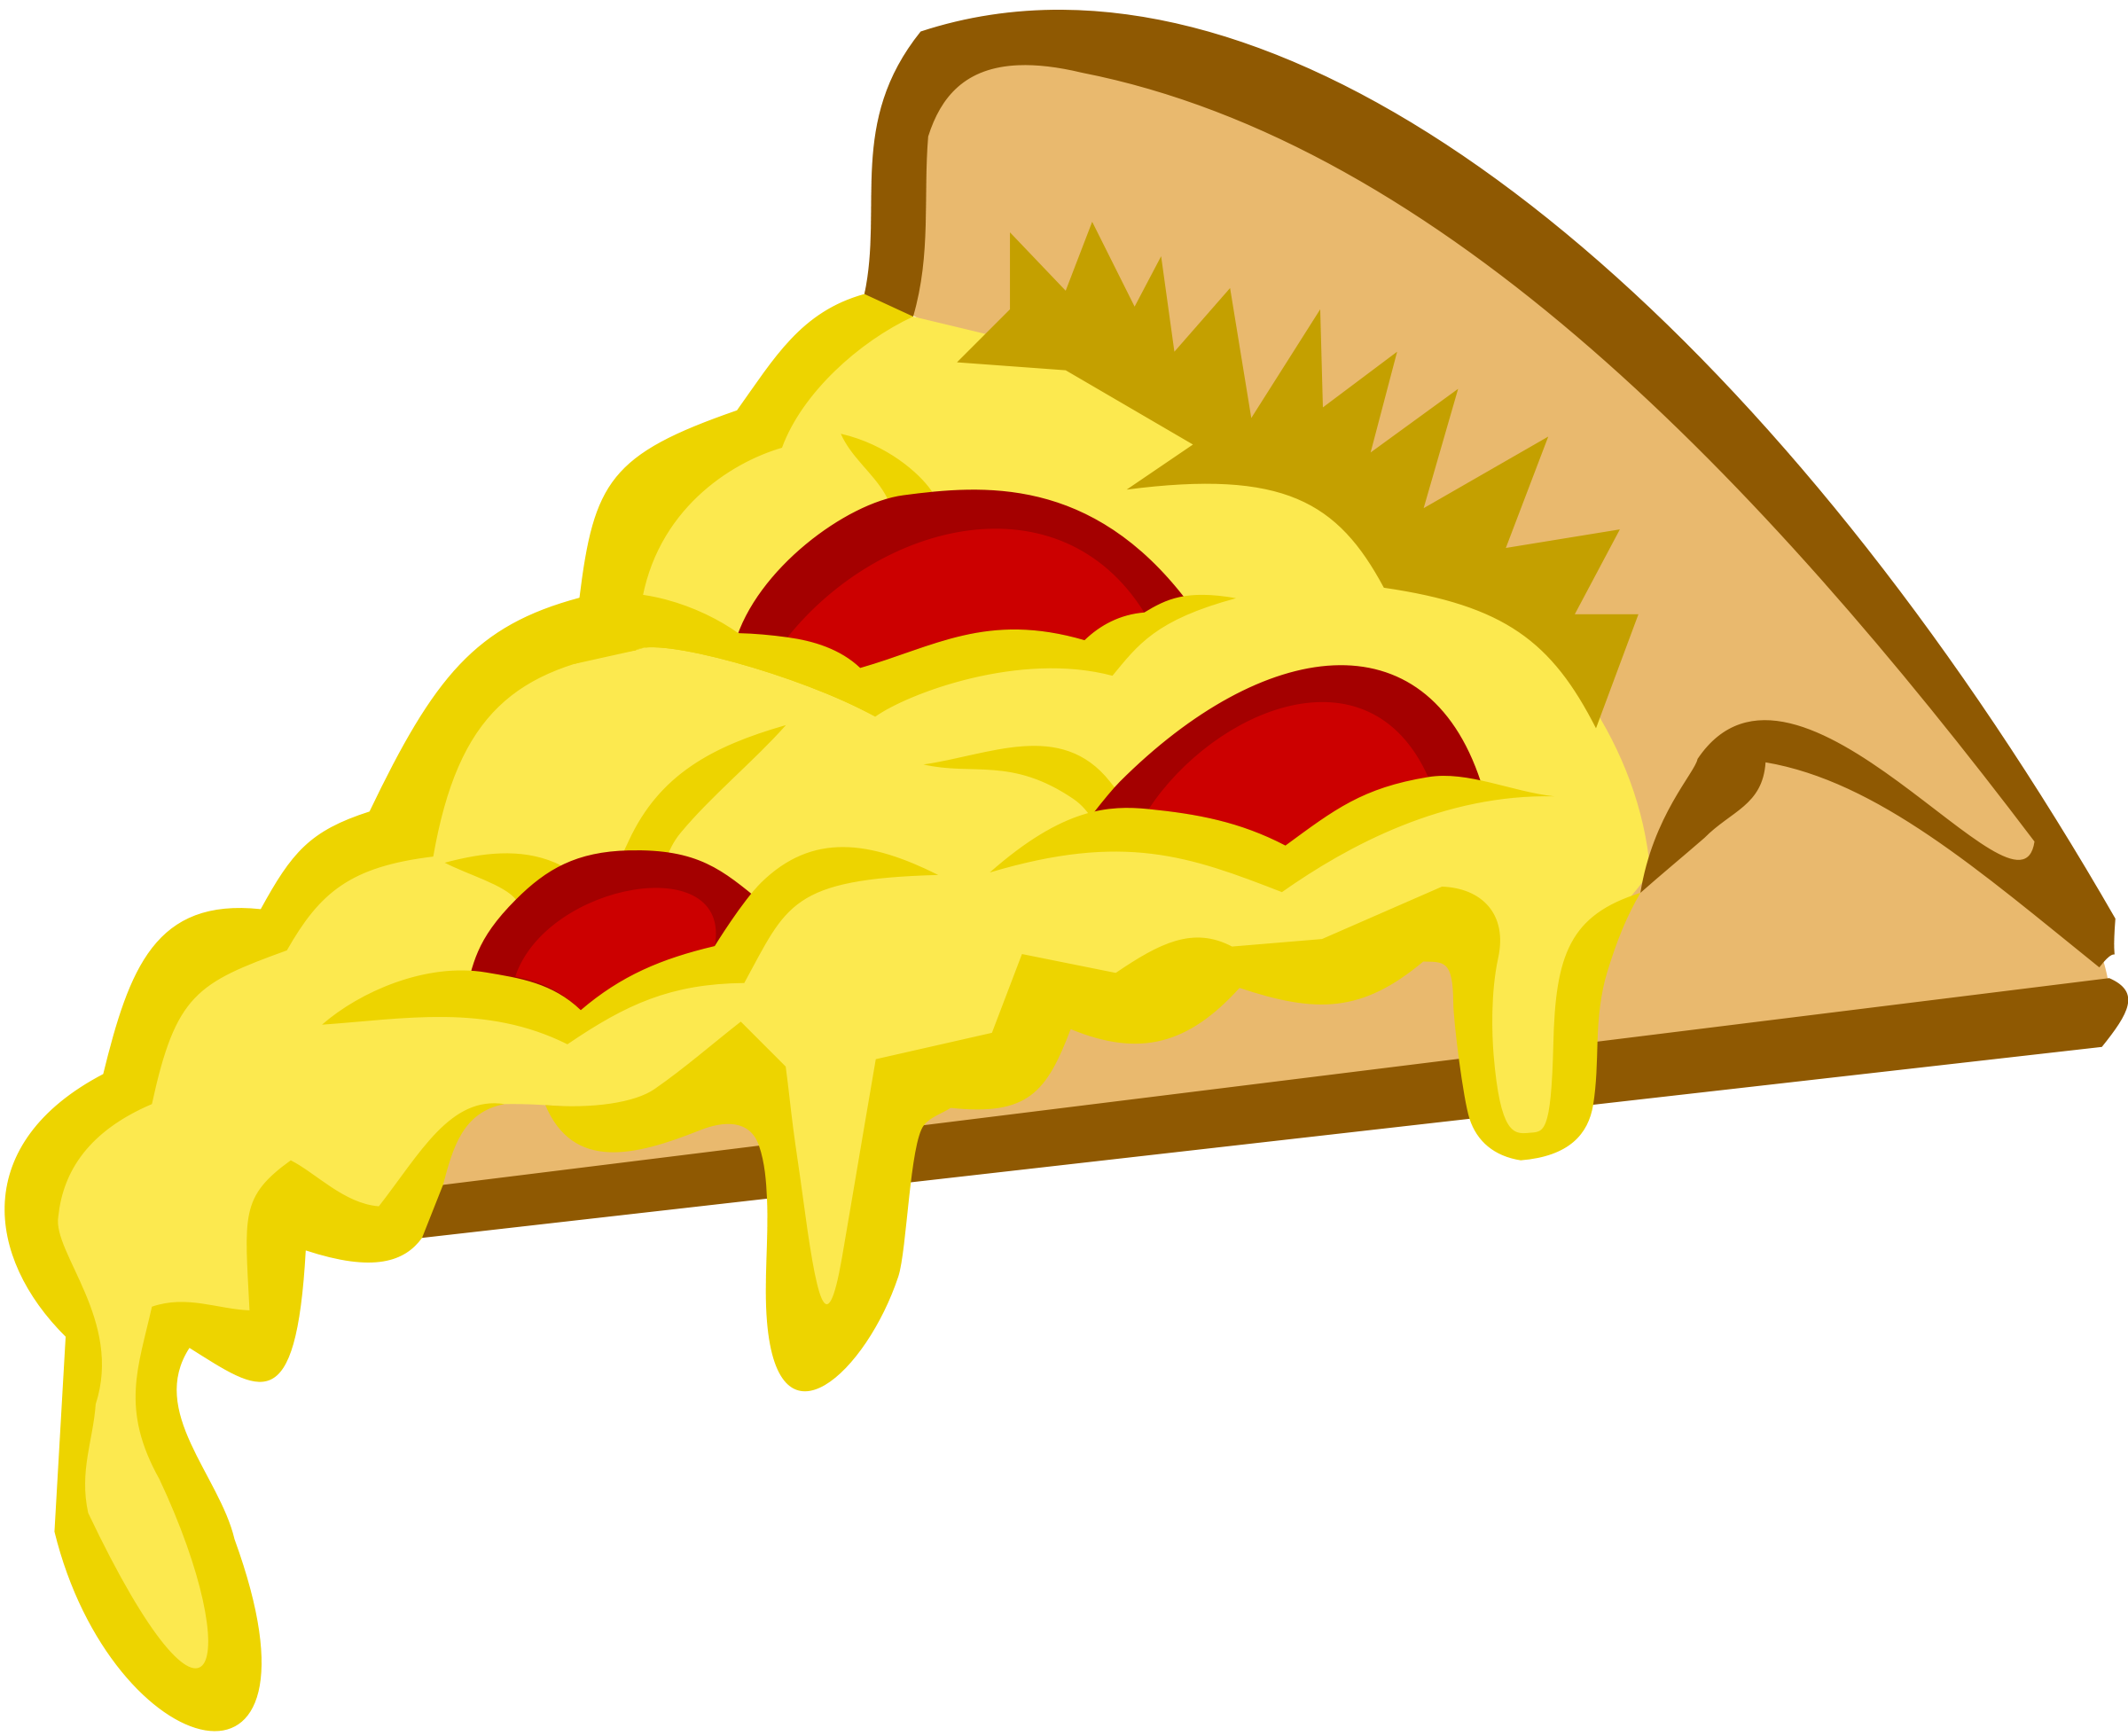 2400x1958 Pepperoni Pizza Clipart